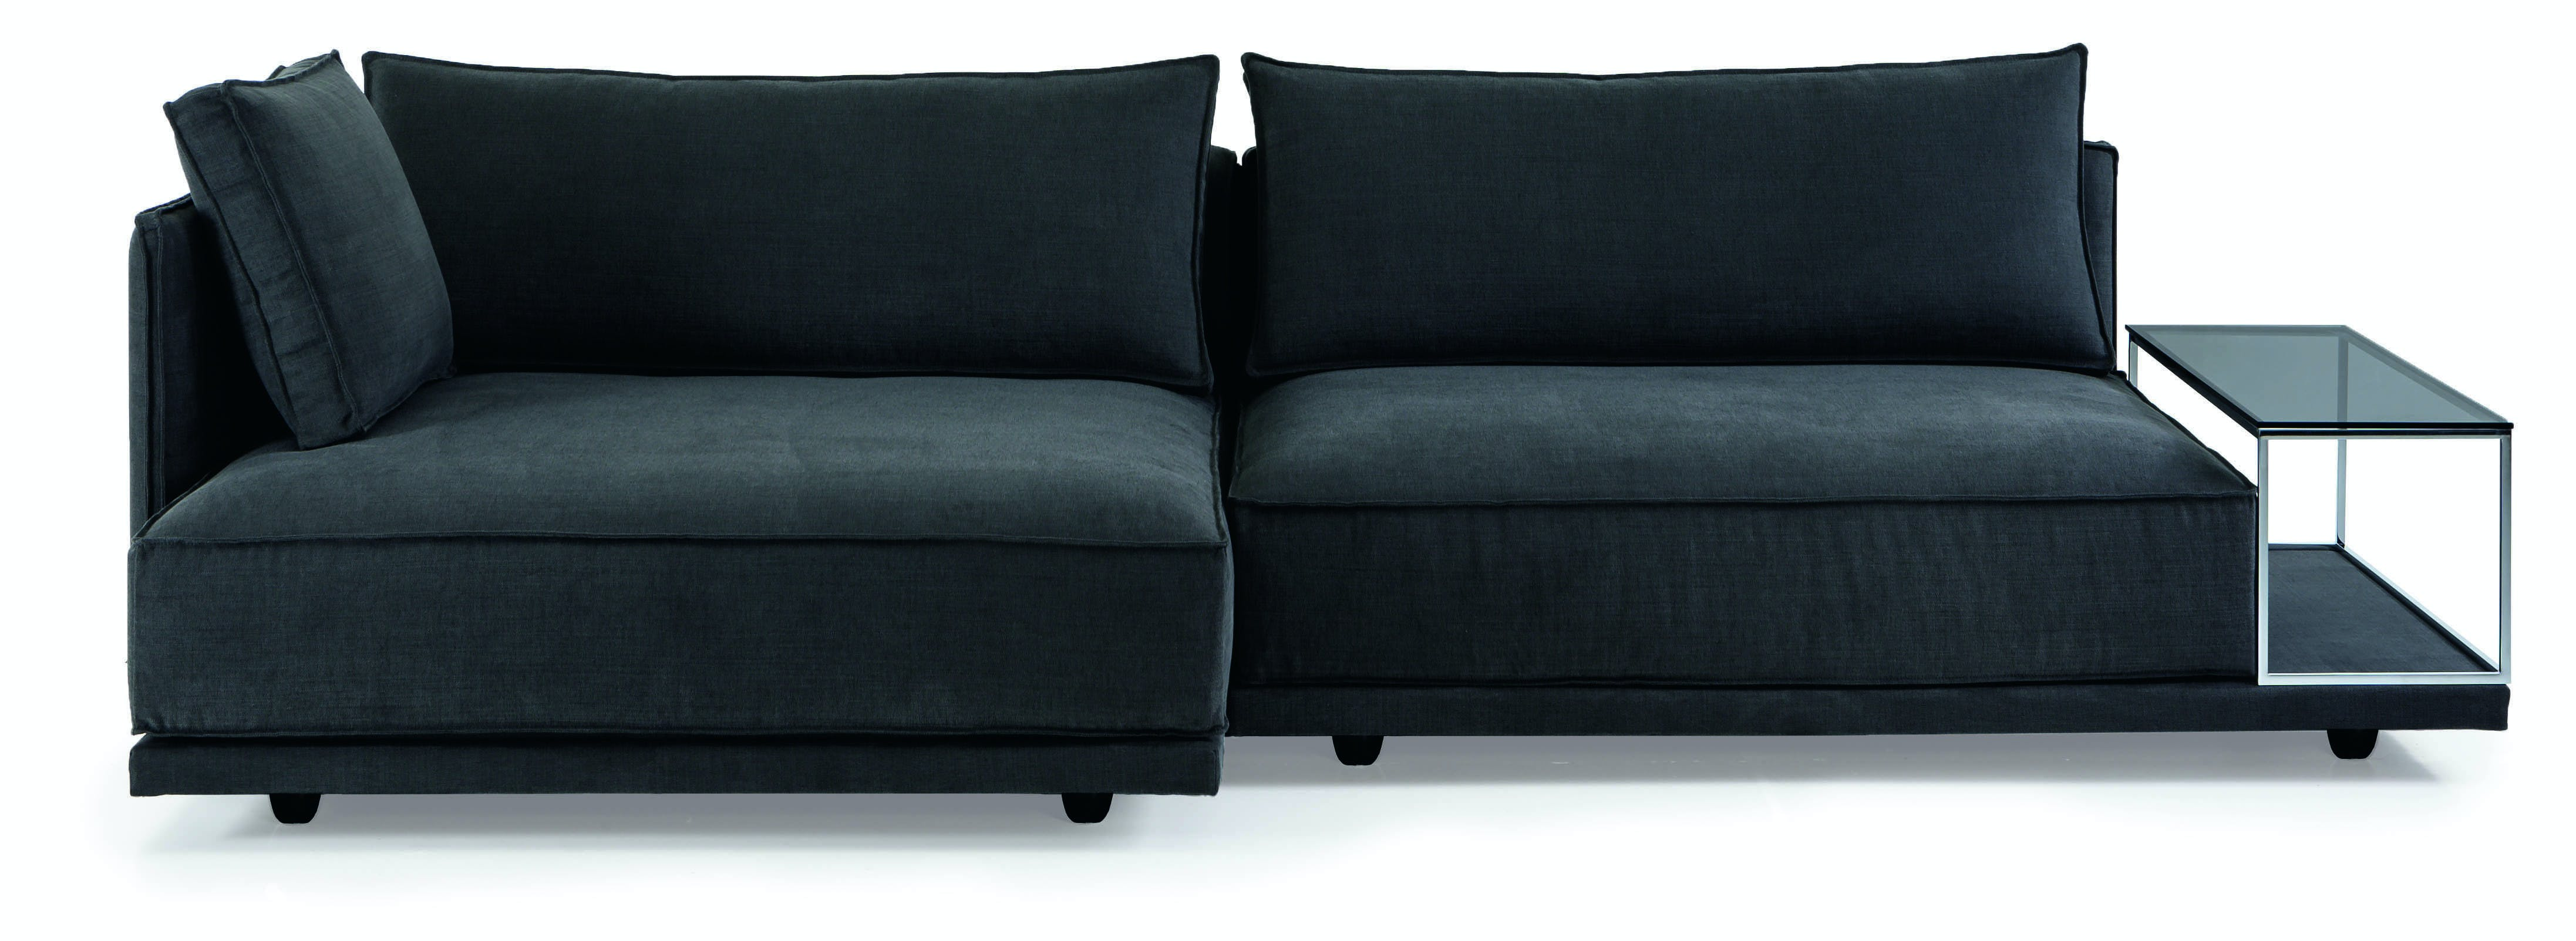 Jab Anstoetz Black Cube Lounge Modular Sofa Haute Living